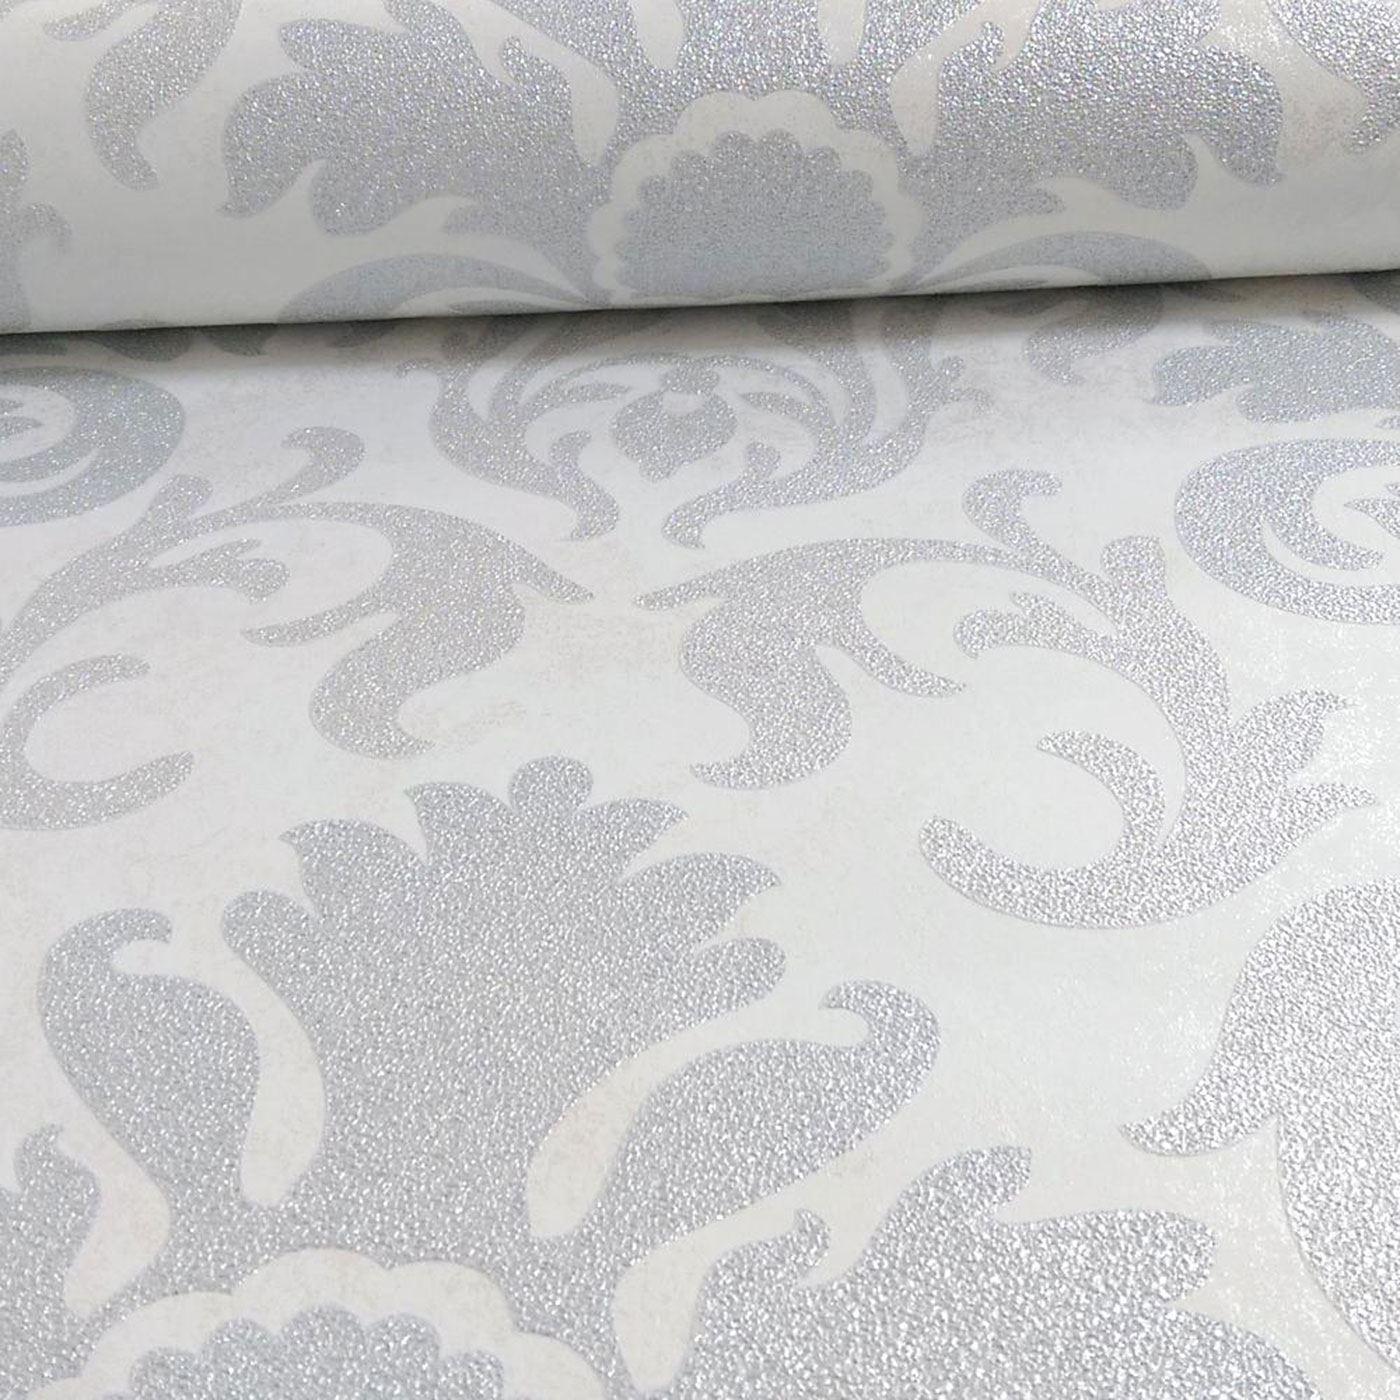 Amazing Wallpaper High Quality Marble - 7dce8348-020a-4739-8e2c-682223f12b26  Snapshot_104567.jpg